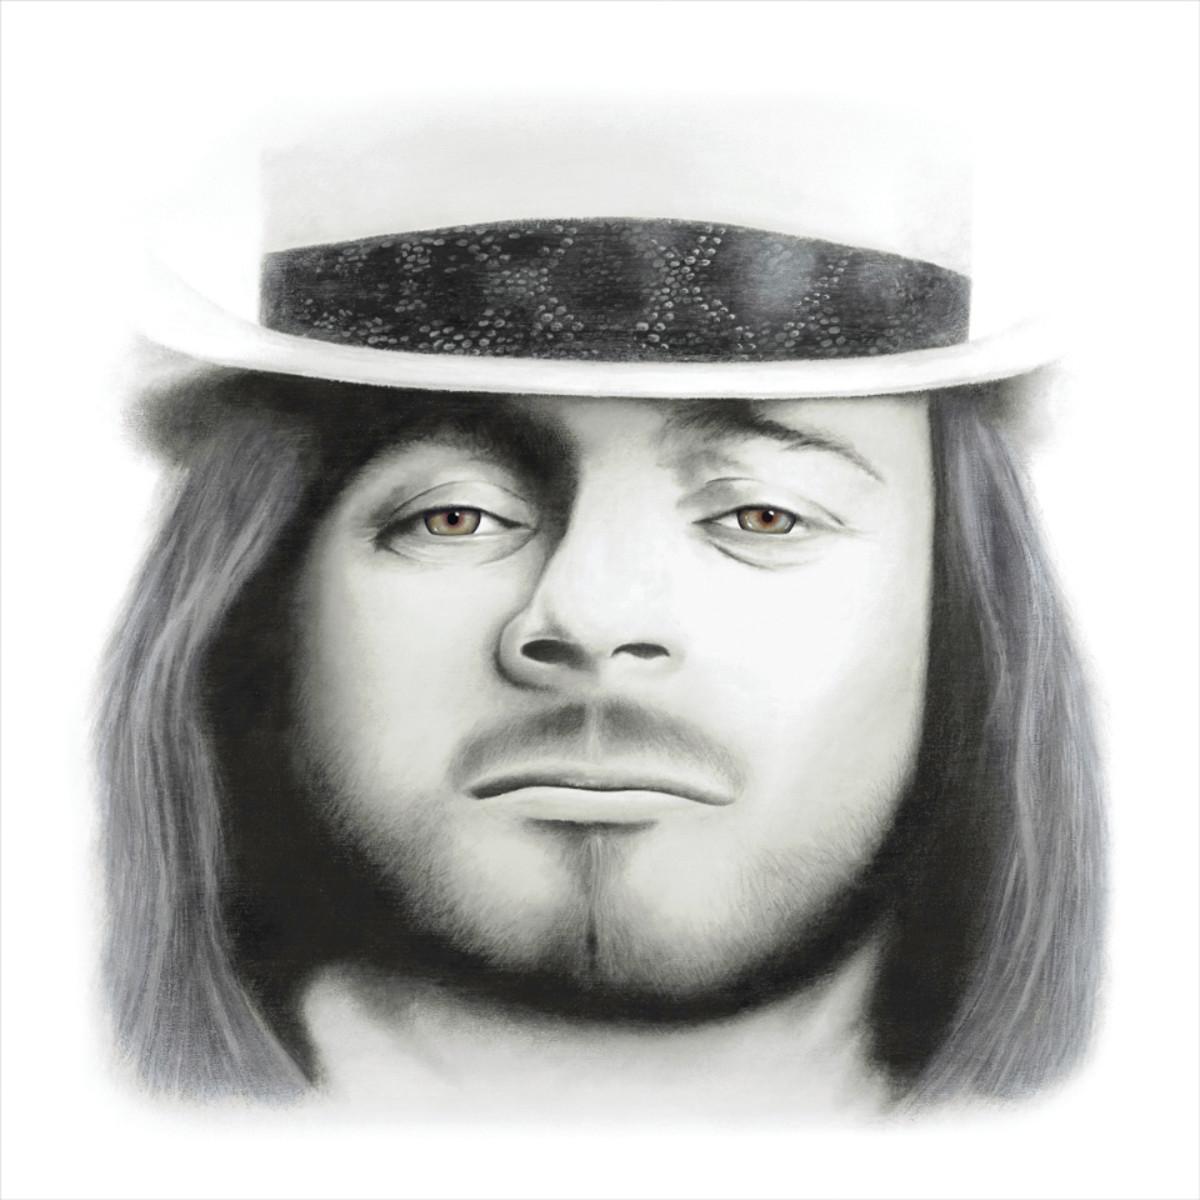 Canvas giclée ofMichael Cartellone's portrait of legendary Lynyrd Skynyrd singer Ronnie Van Zant.